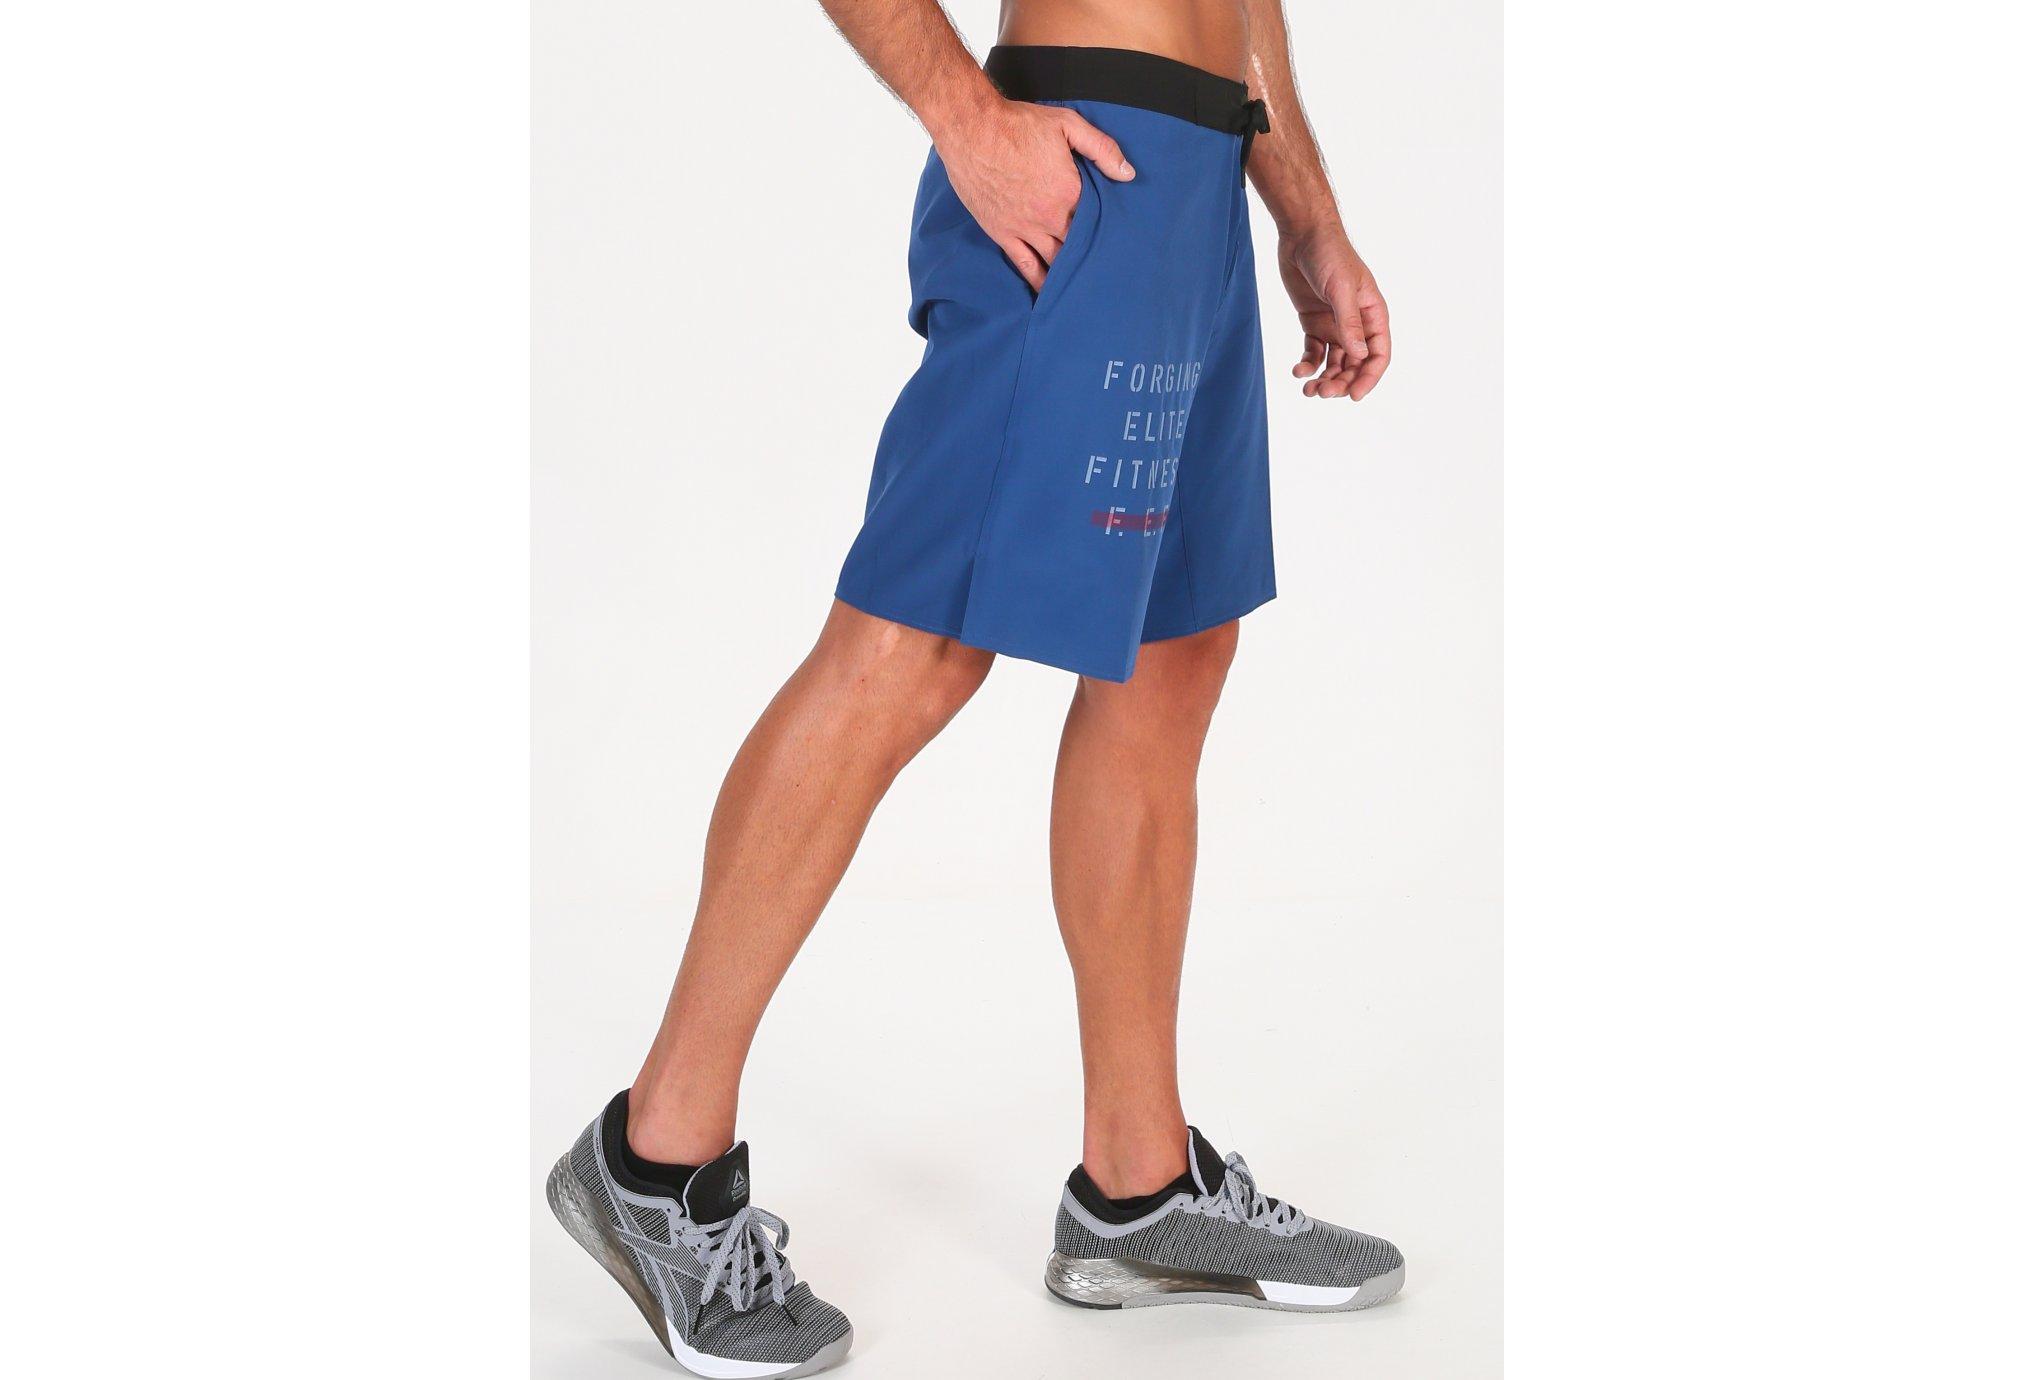 Reebok Crossfit Epic M vêtement running homme